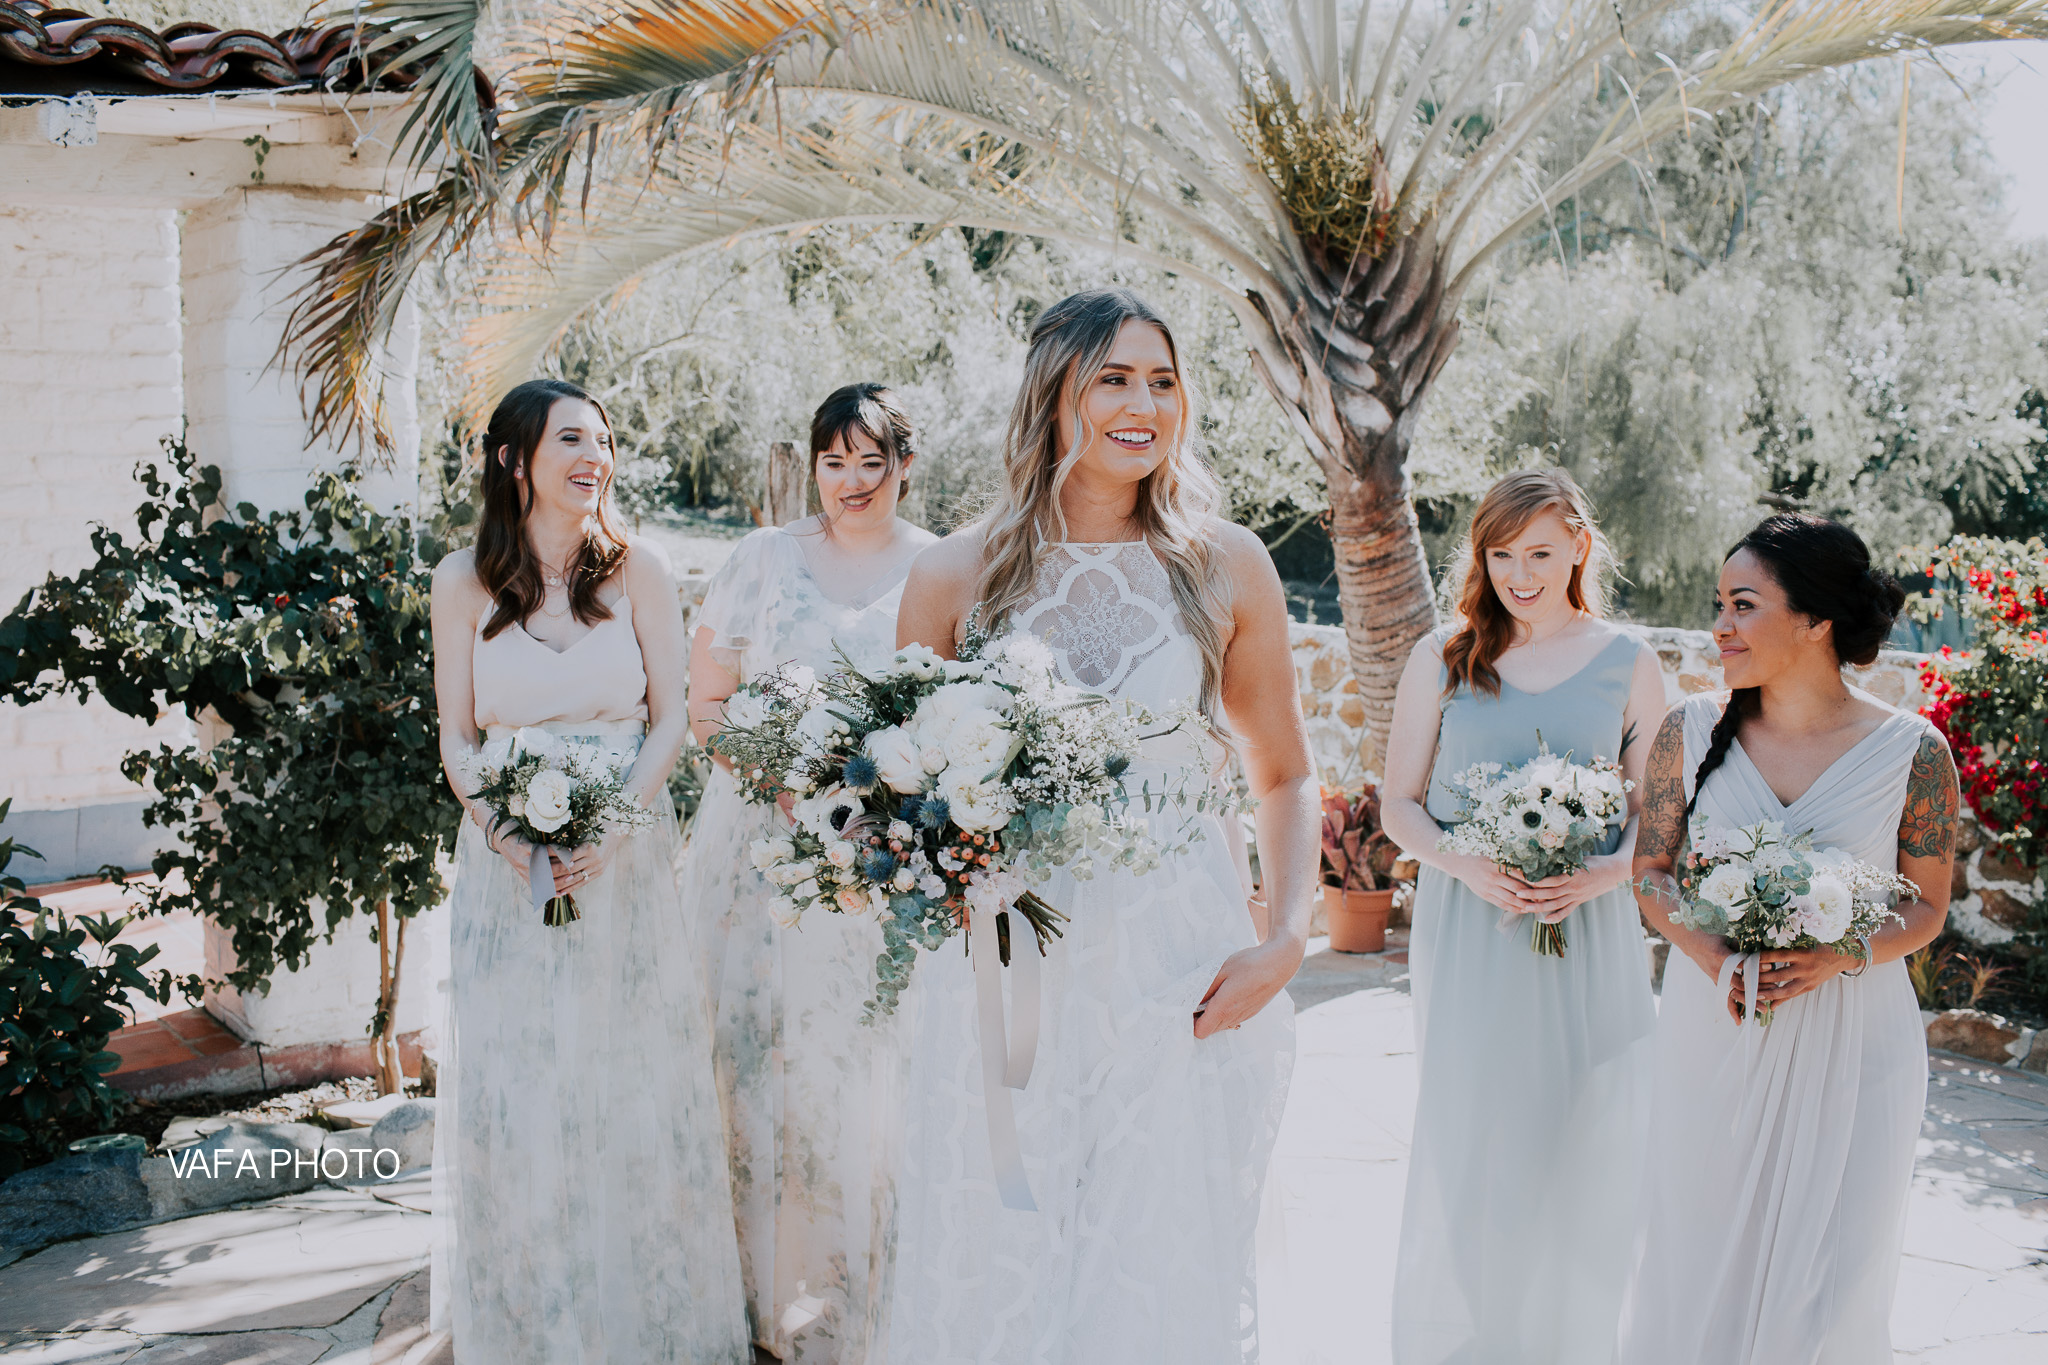 Leo-Carrillo-Ranch-Wedding-Lauren-Mike-Vafa-Photo-380.jpg